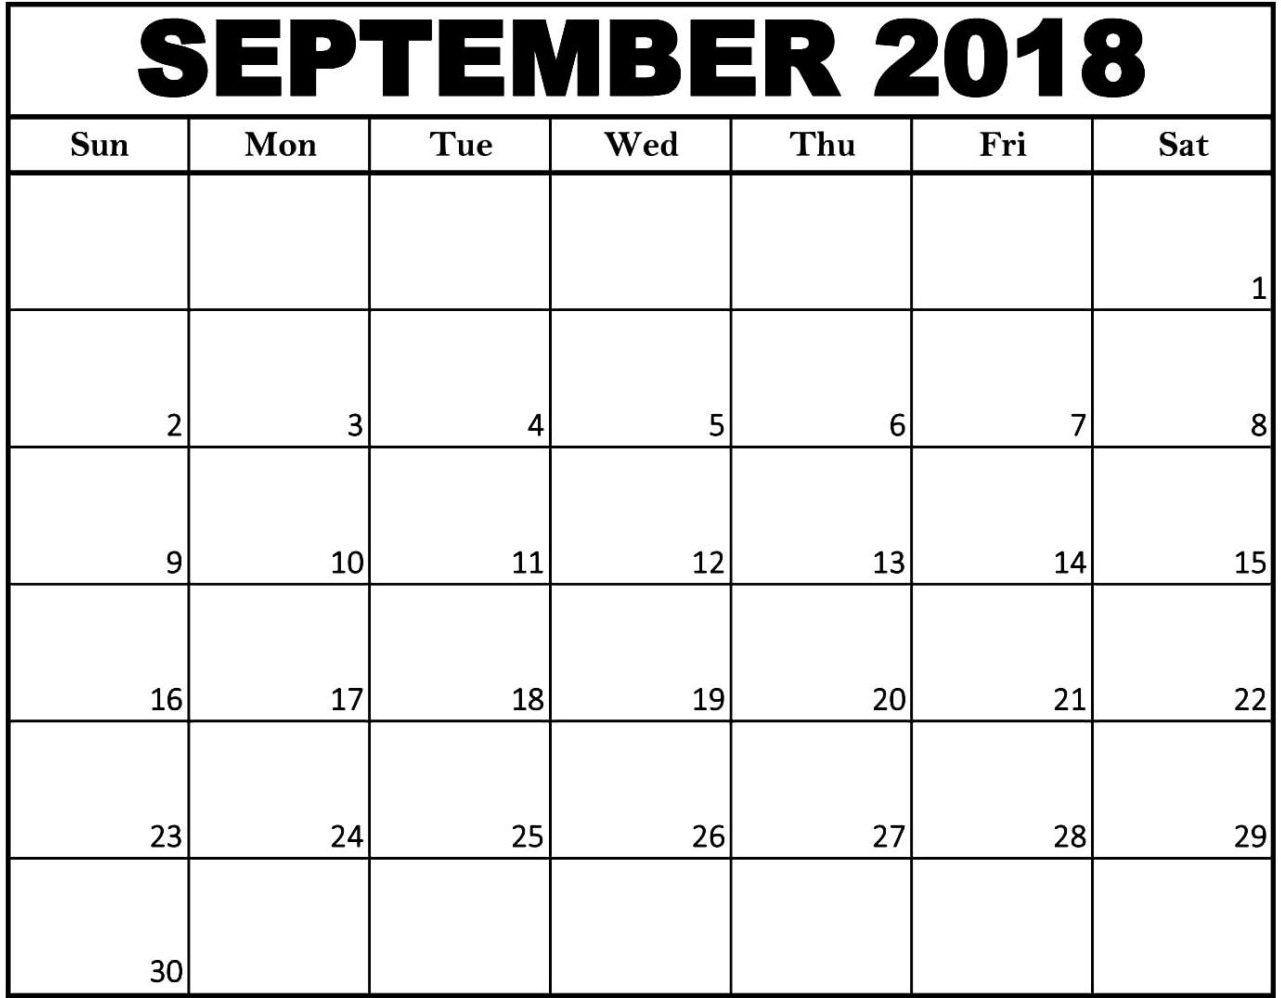 Blank September Calendar Worksheet Doc With Images